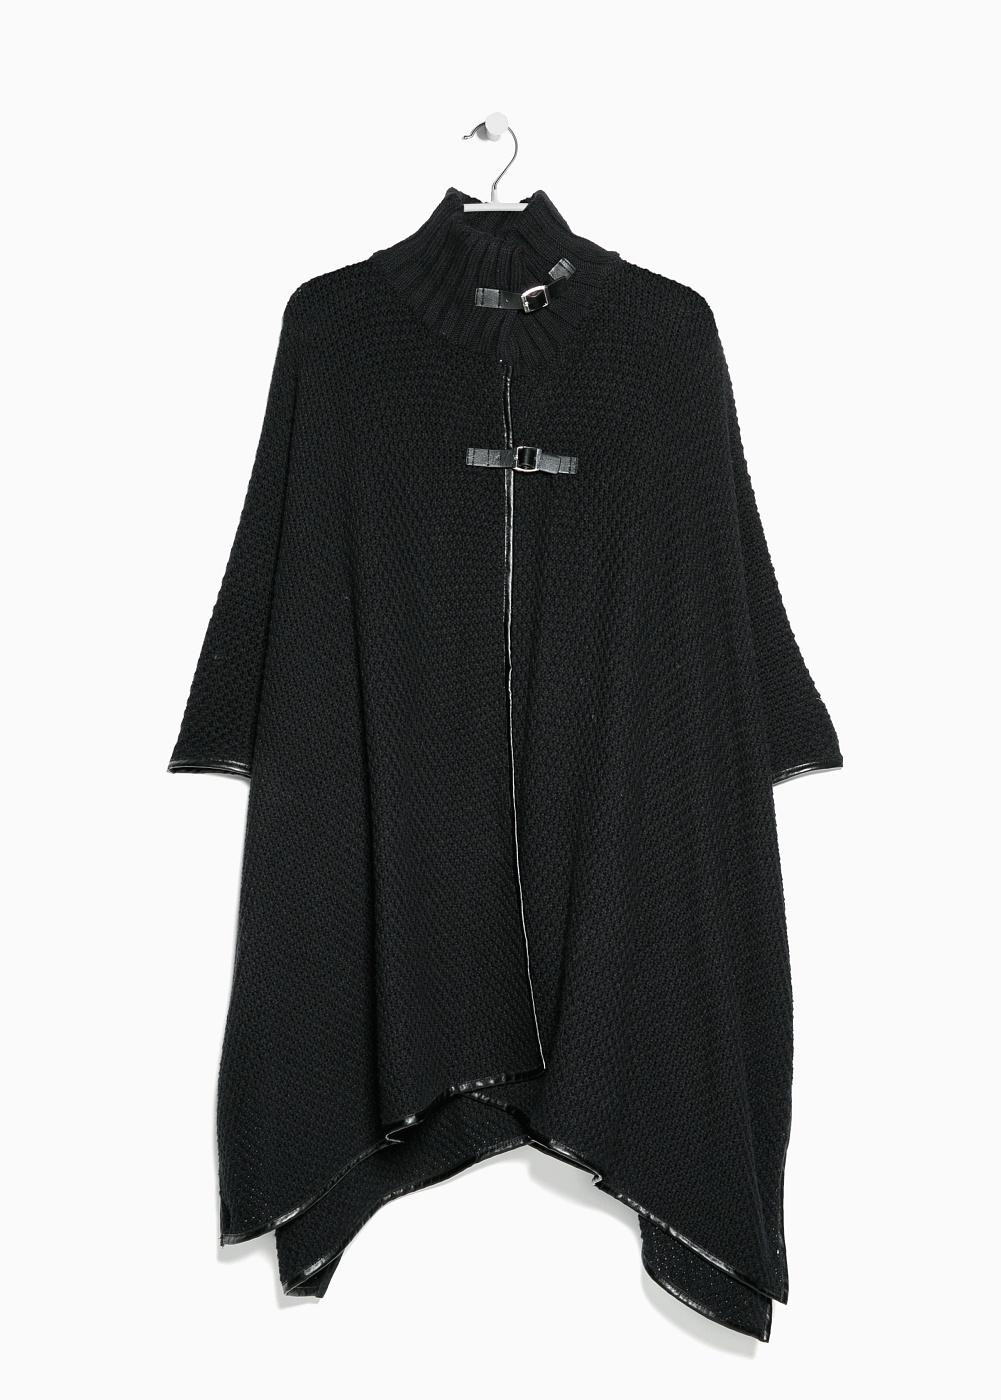 http://shop.mango.com/GB/p0/women/clothing/cardigans-and-sweaters/cardigans/alpaca-wool-blend-cape/?id=33007566_02&n=1&s=prendas.cardigans&ident=0__0_1415568012196&ts=1415568012196